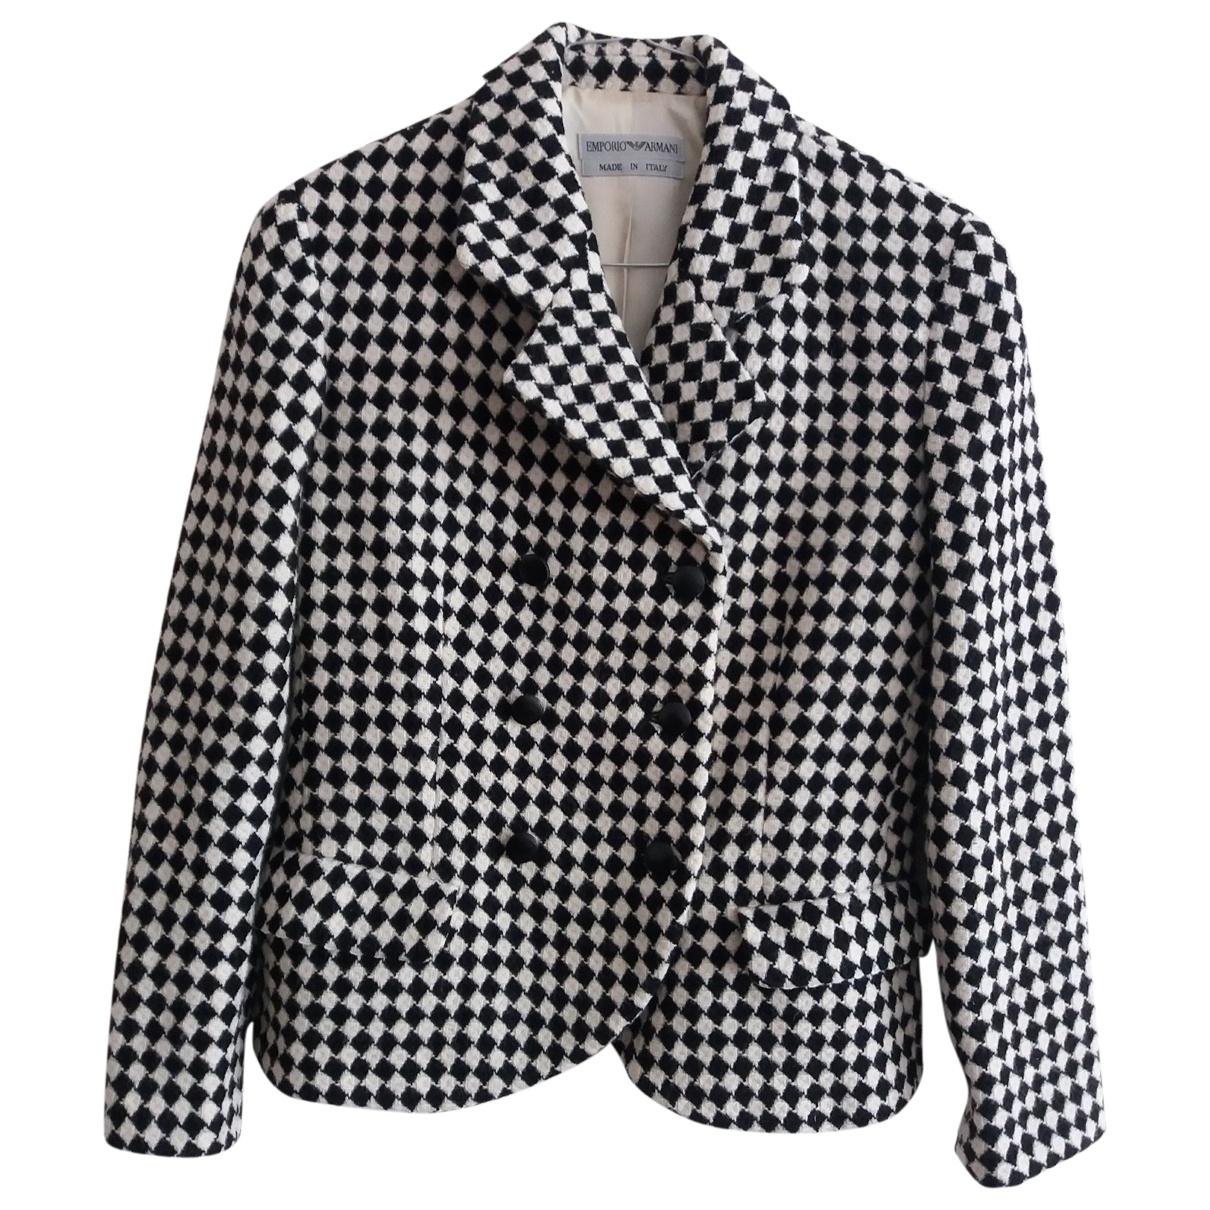 Emporio Armani \N Wool jacket for Women L International